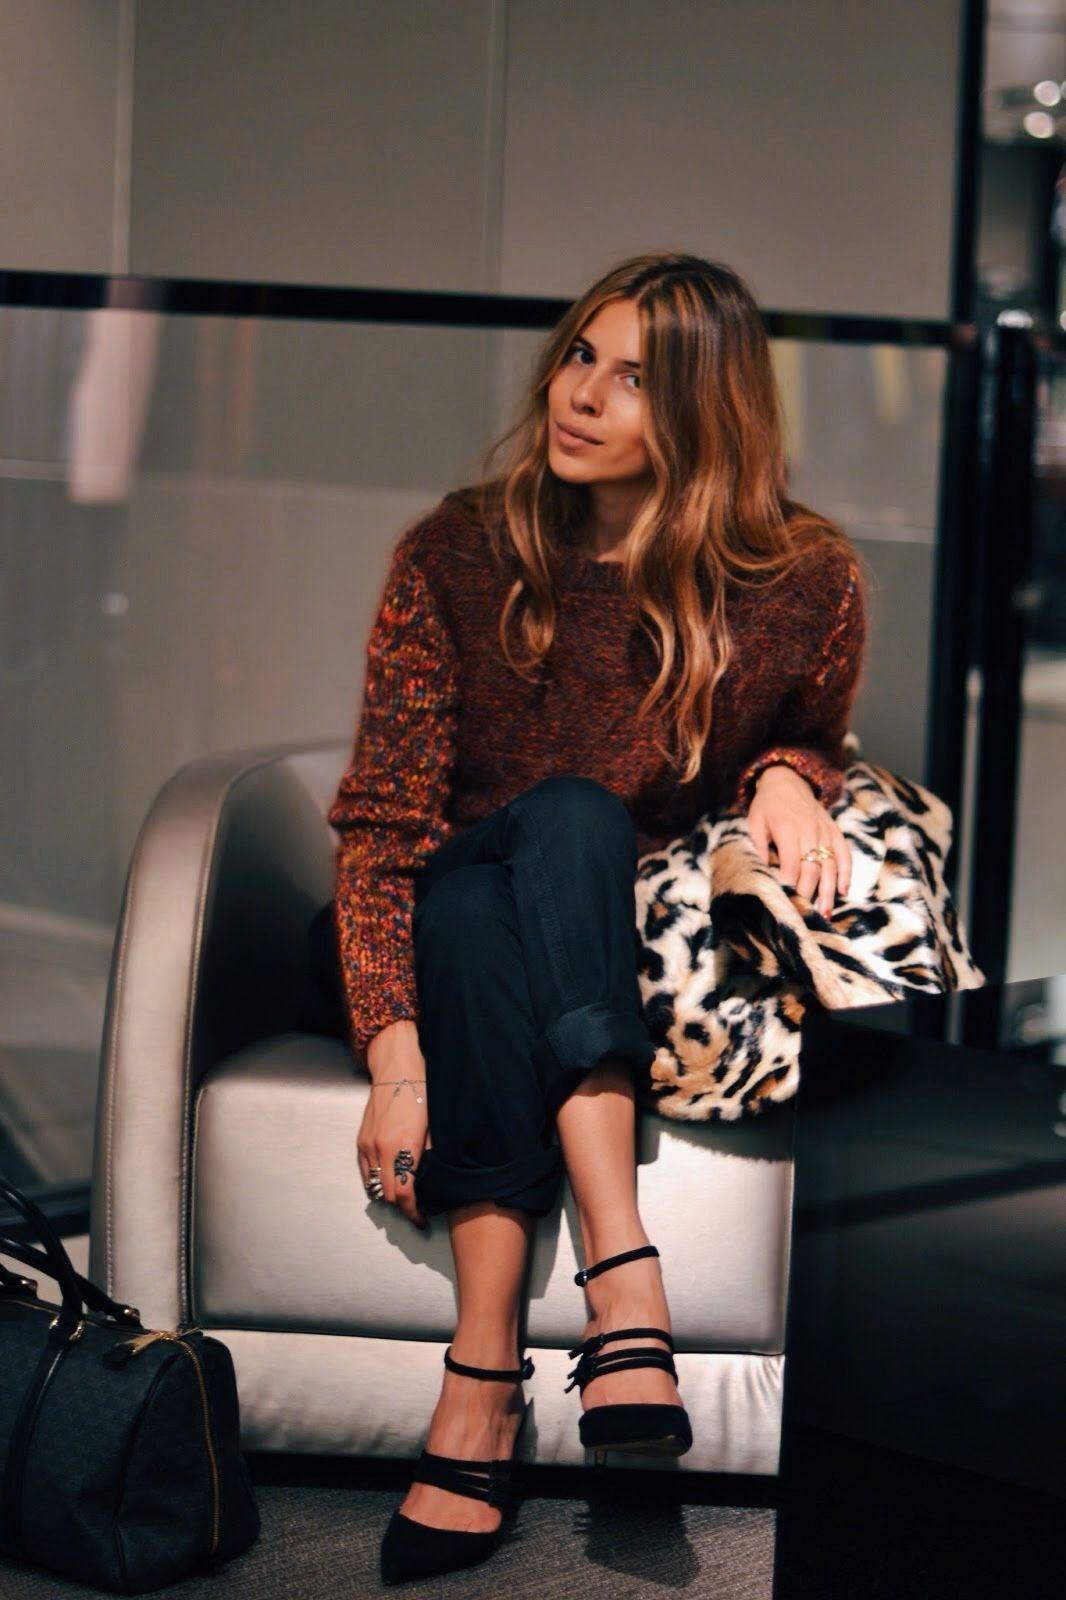 fall fashion via maja wyh | follow and repin for more